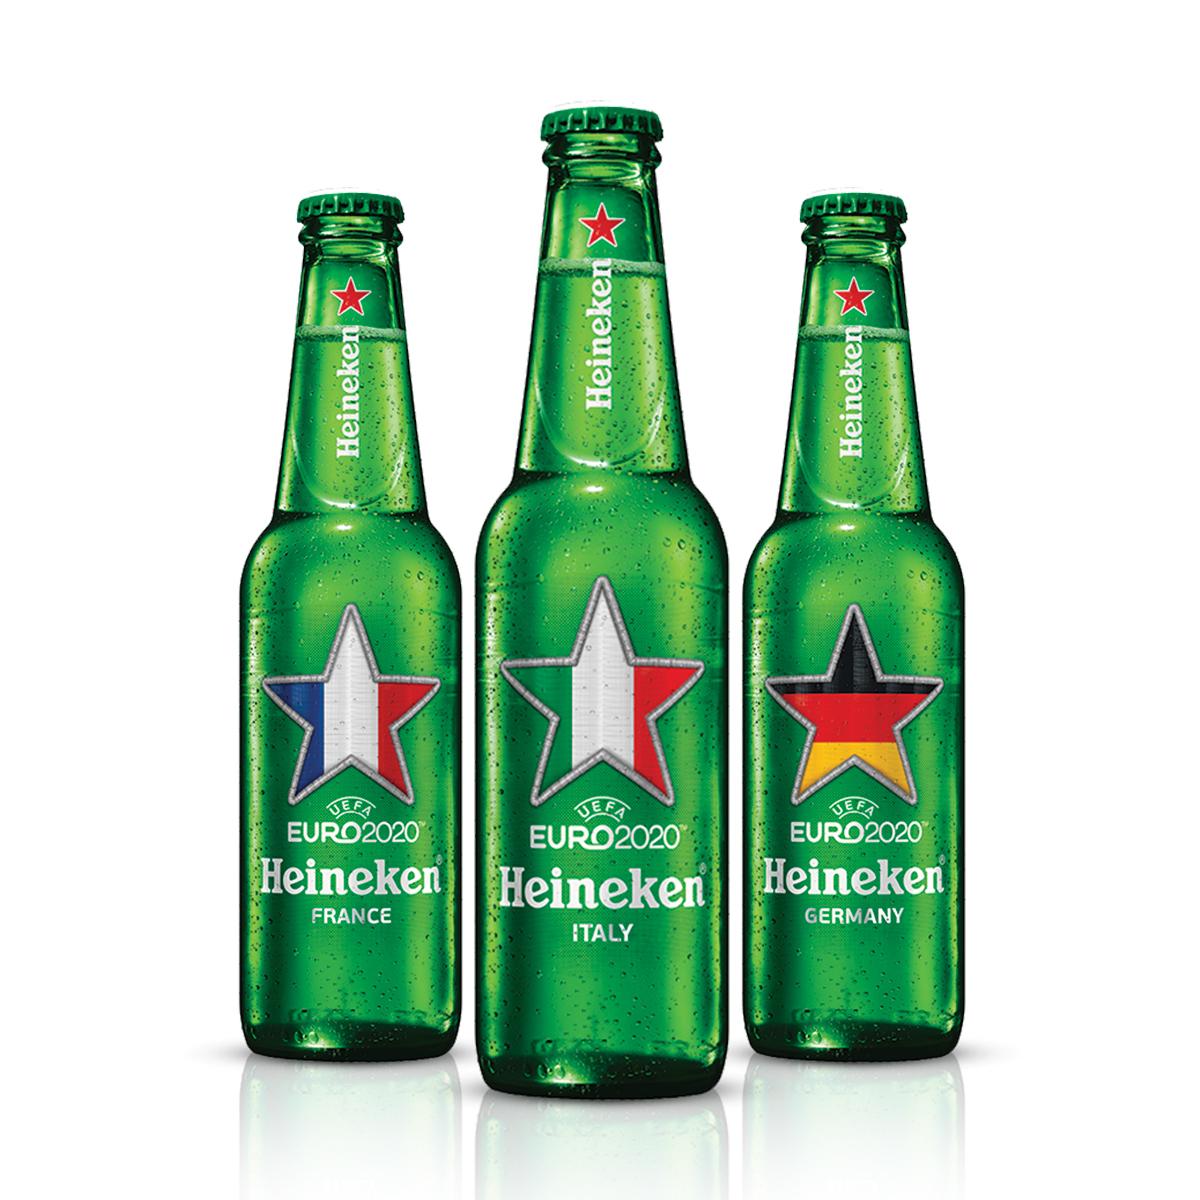 Heineken Euro 2020 (33 cl) - pack assortito 3 pezzi